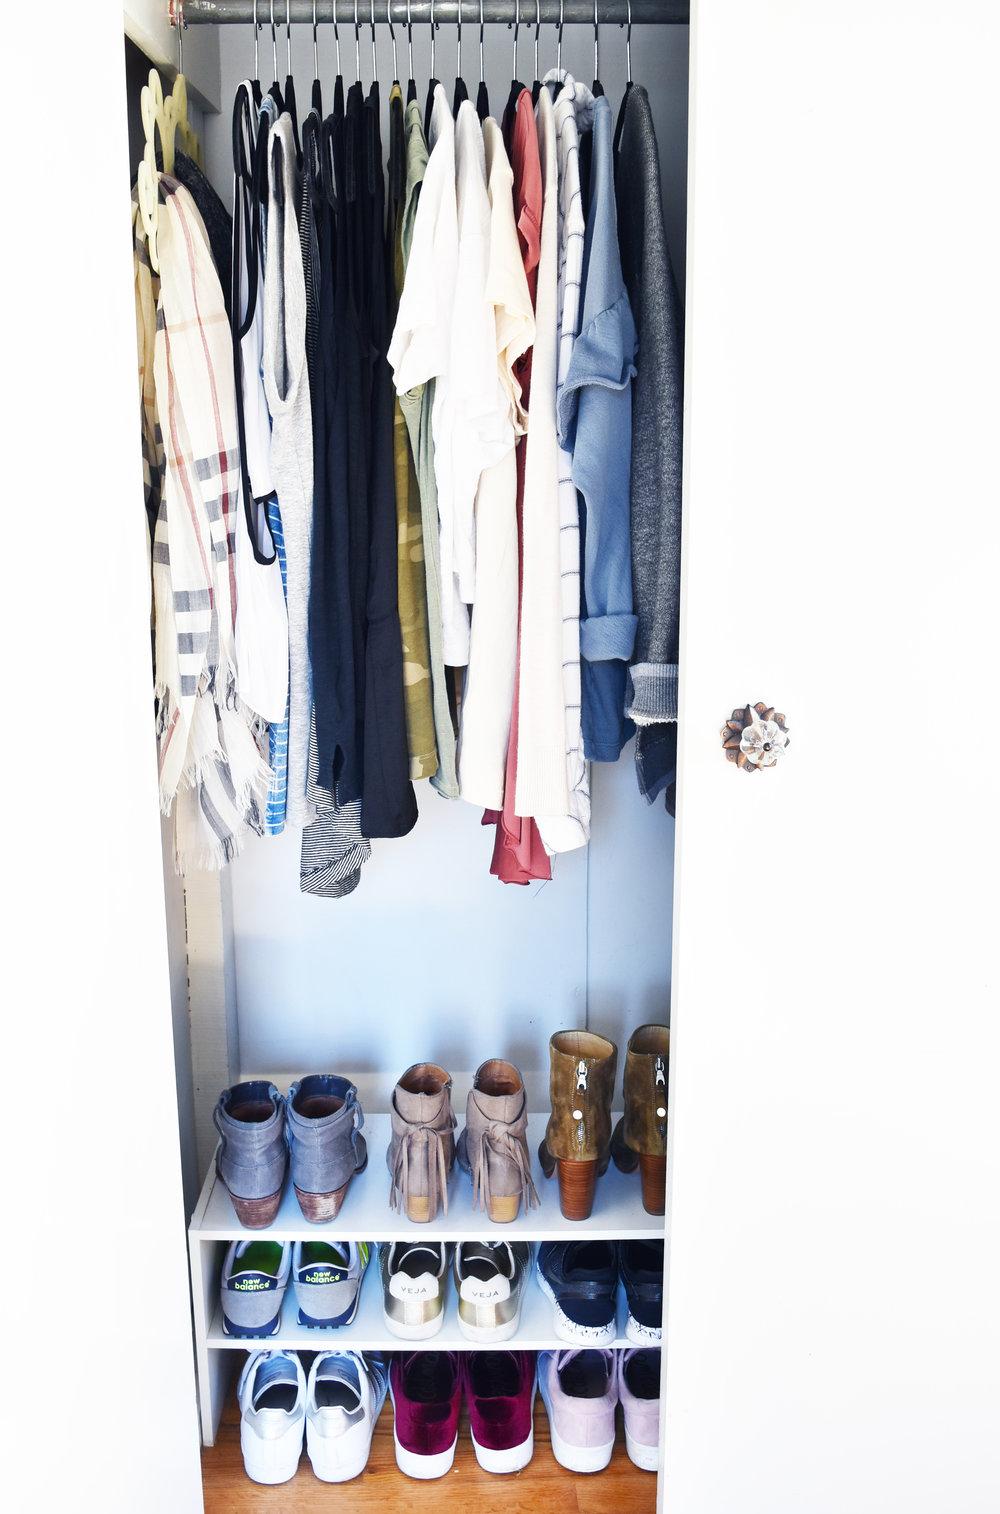 A Peak Into My Closet!